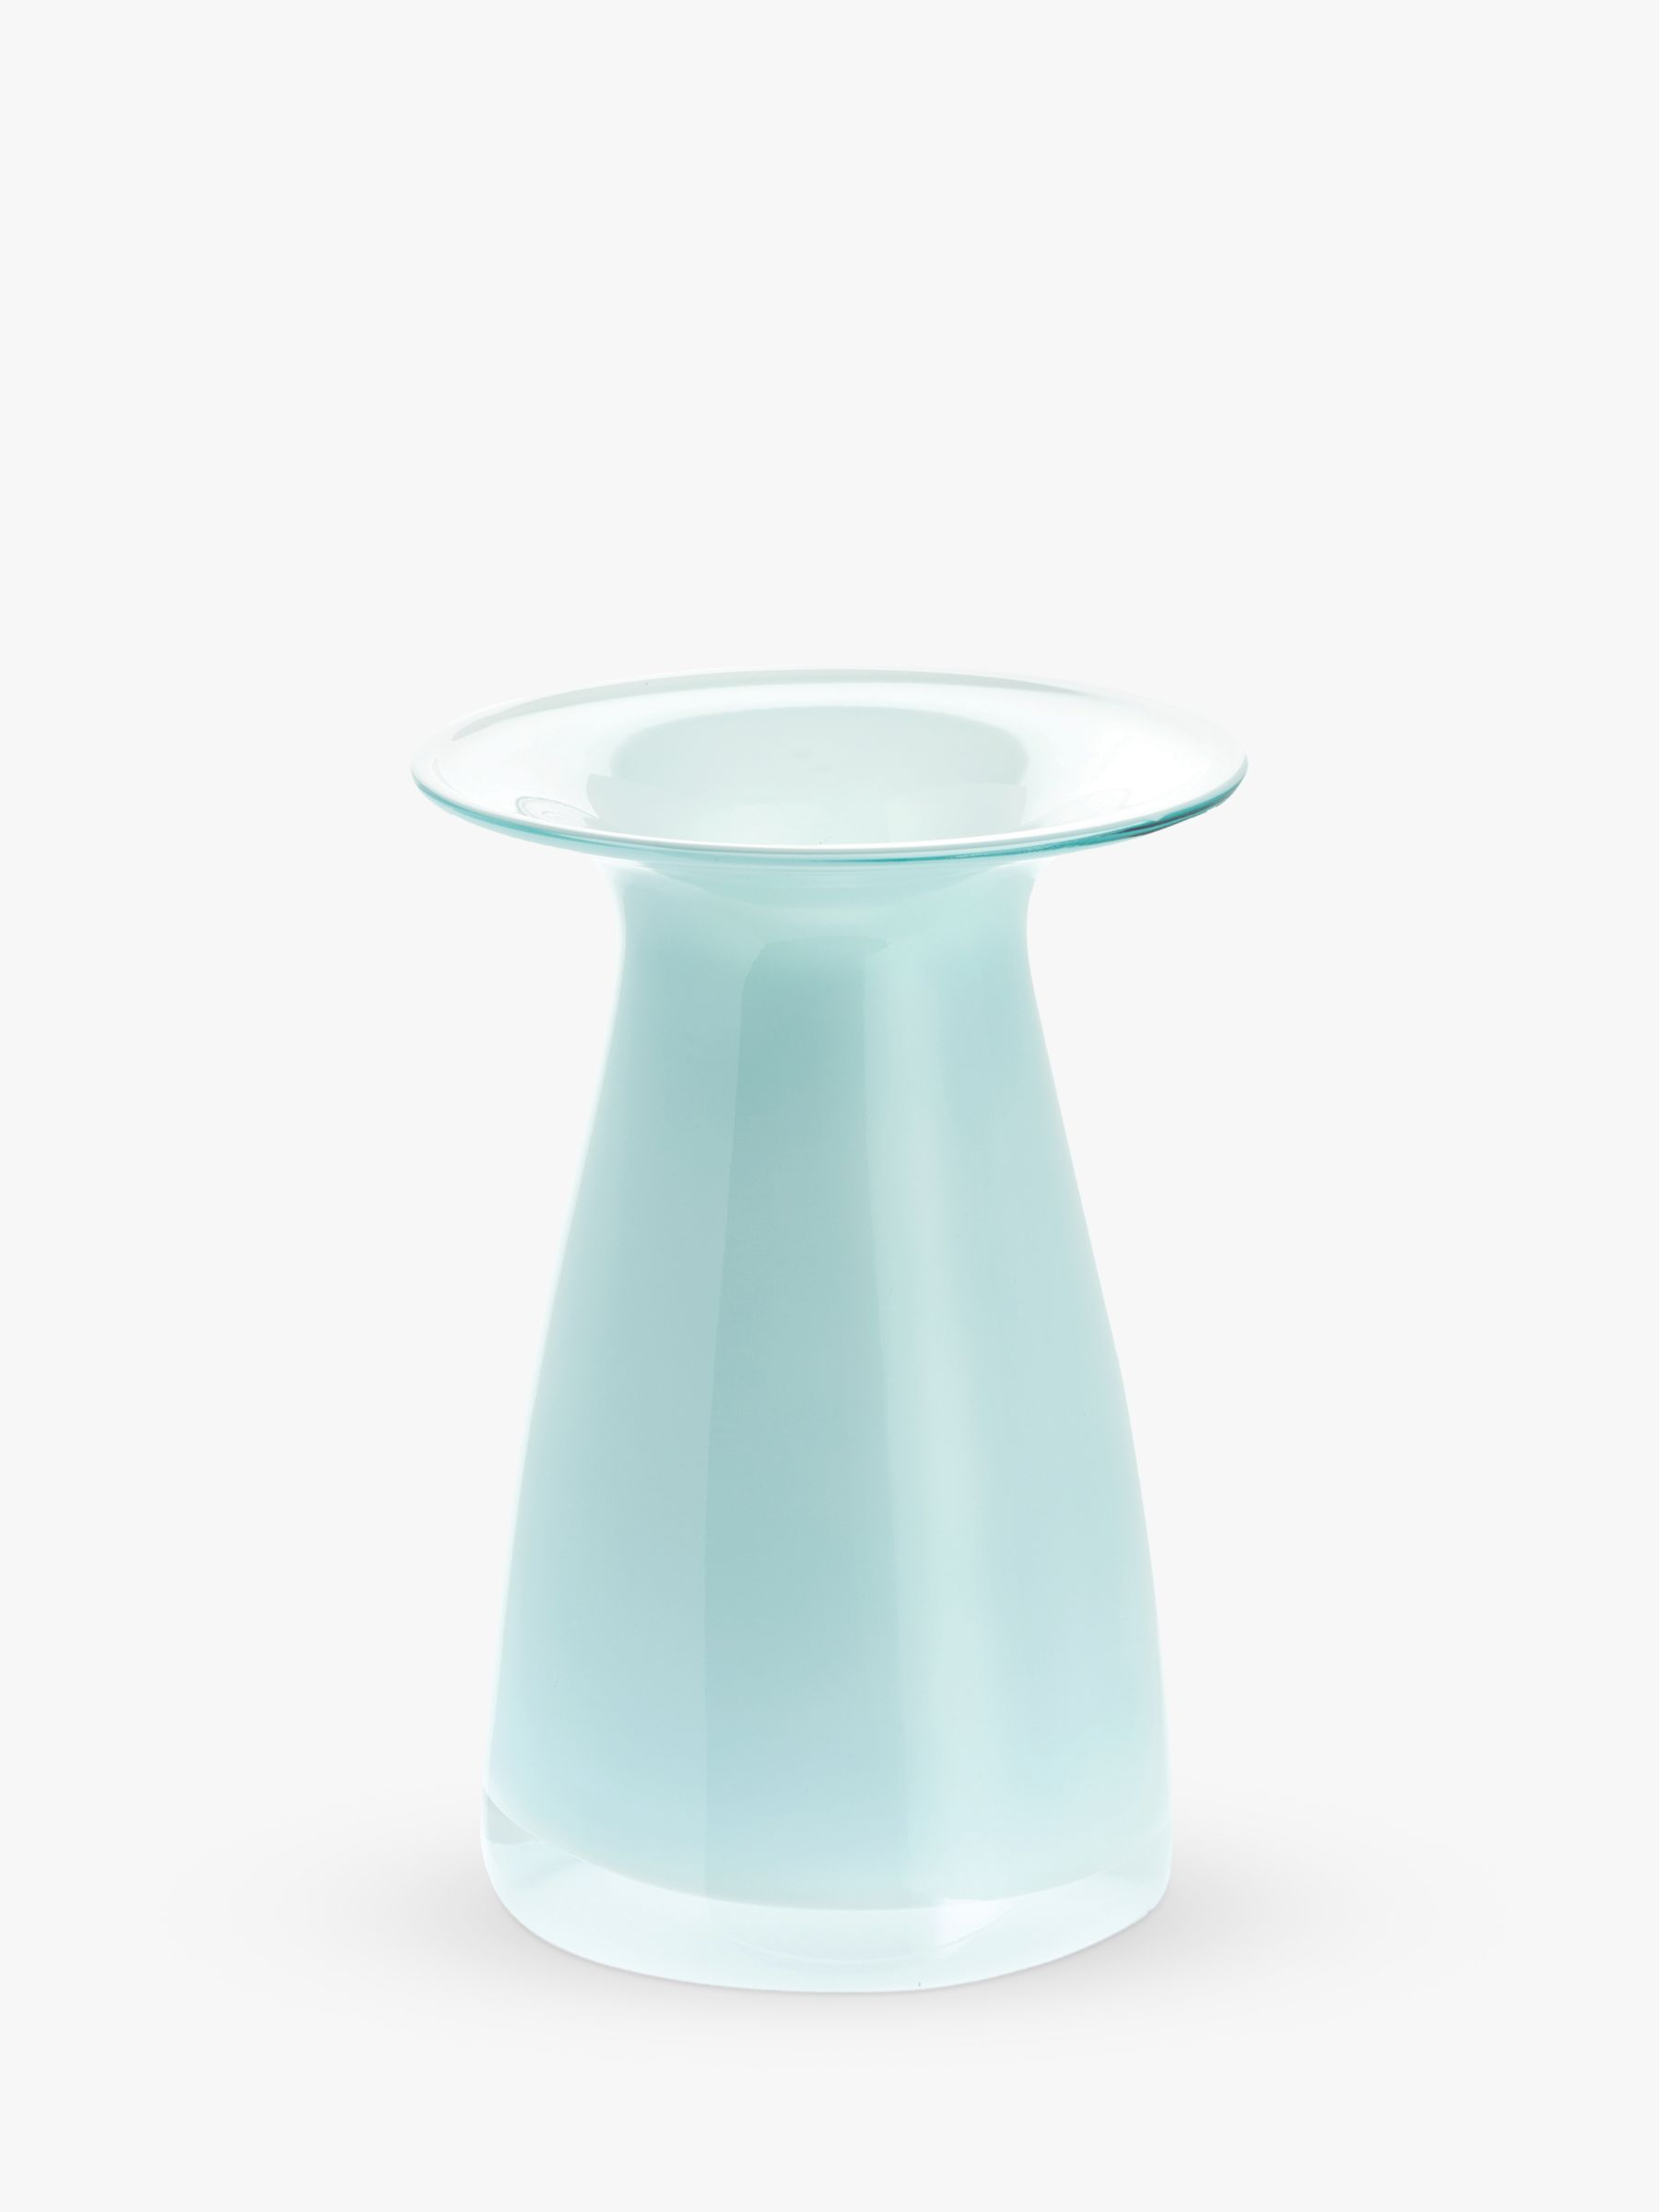 Dartington Crystal Dartington Crystal Juno Vase, H20.5cm